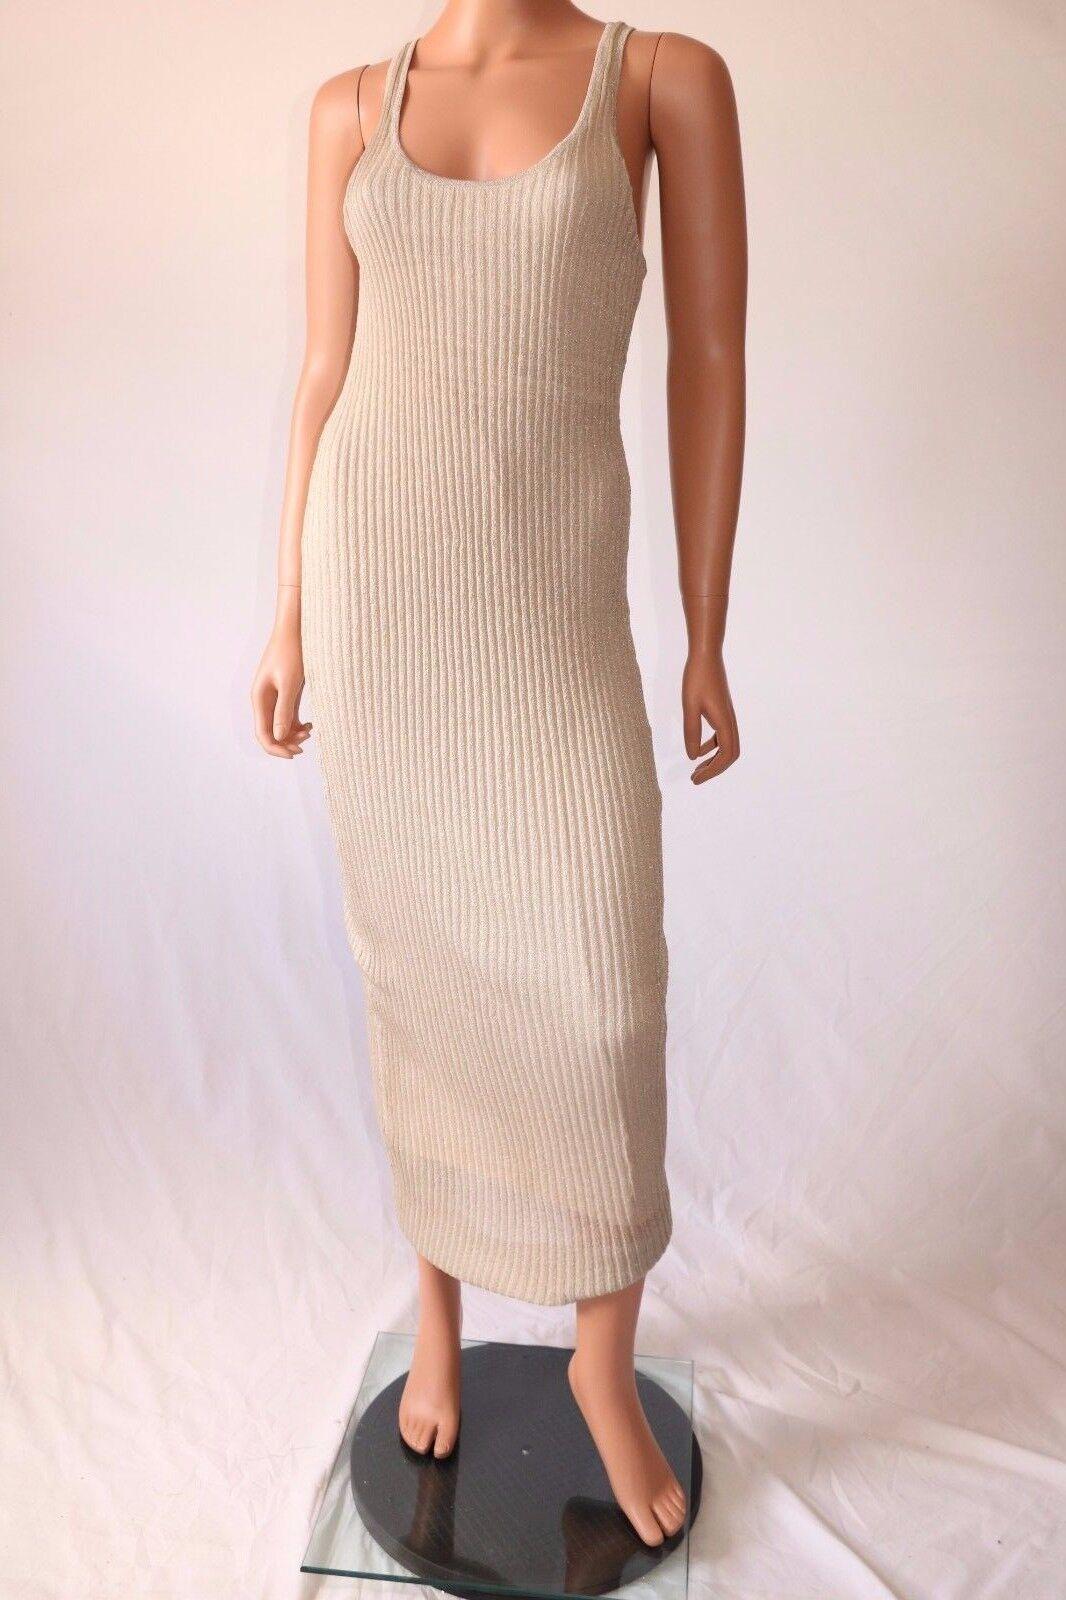 Haute Hippie Beige Sleeveless Lined Knitted Stretch Long Dress